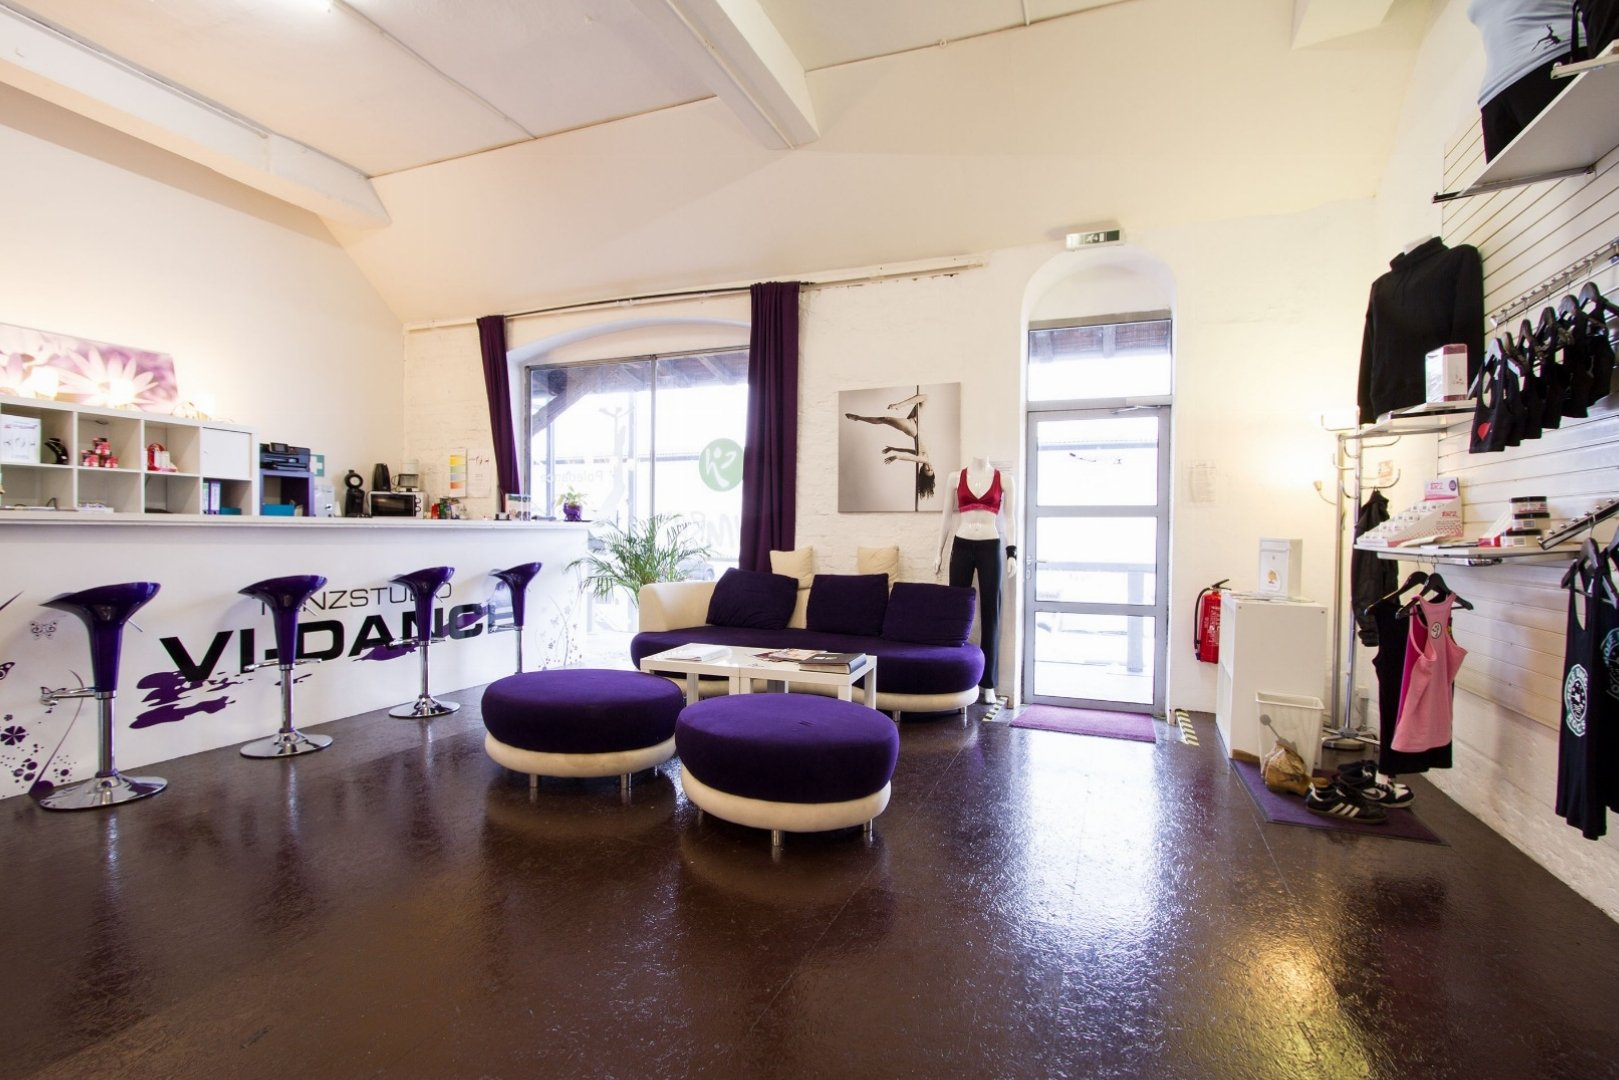 VI-Dance GmbH Studio Münster in 48153 Münster